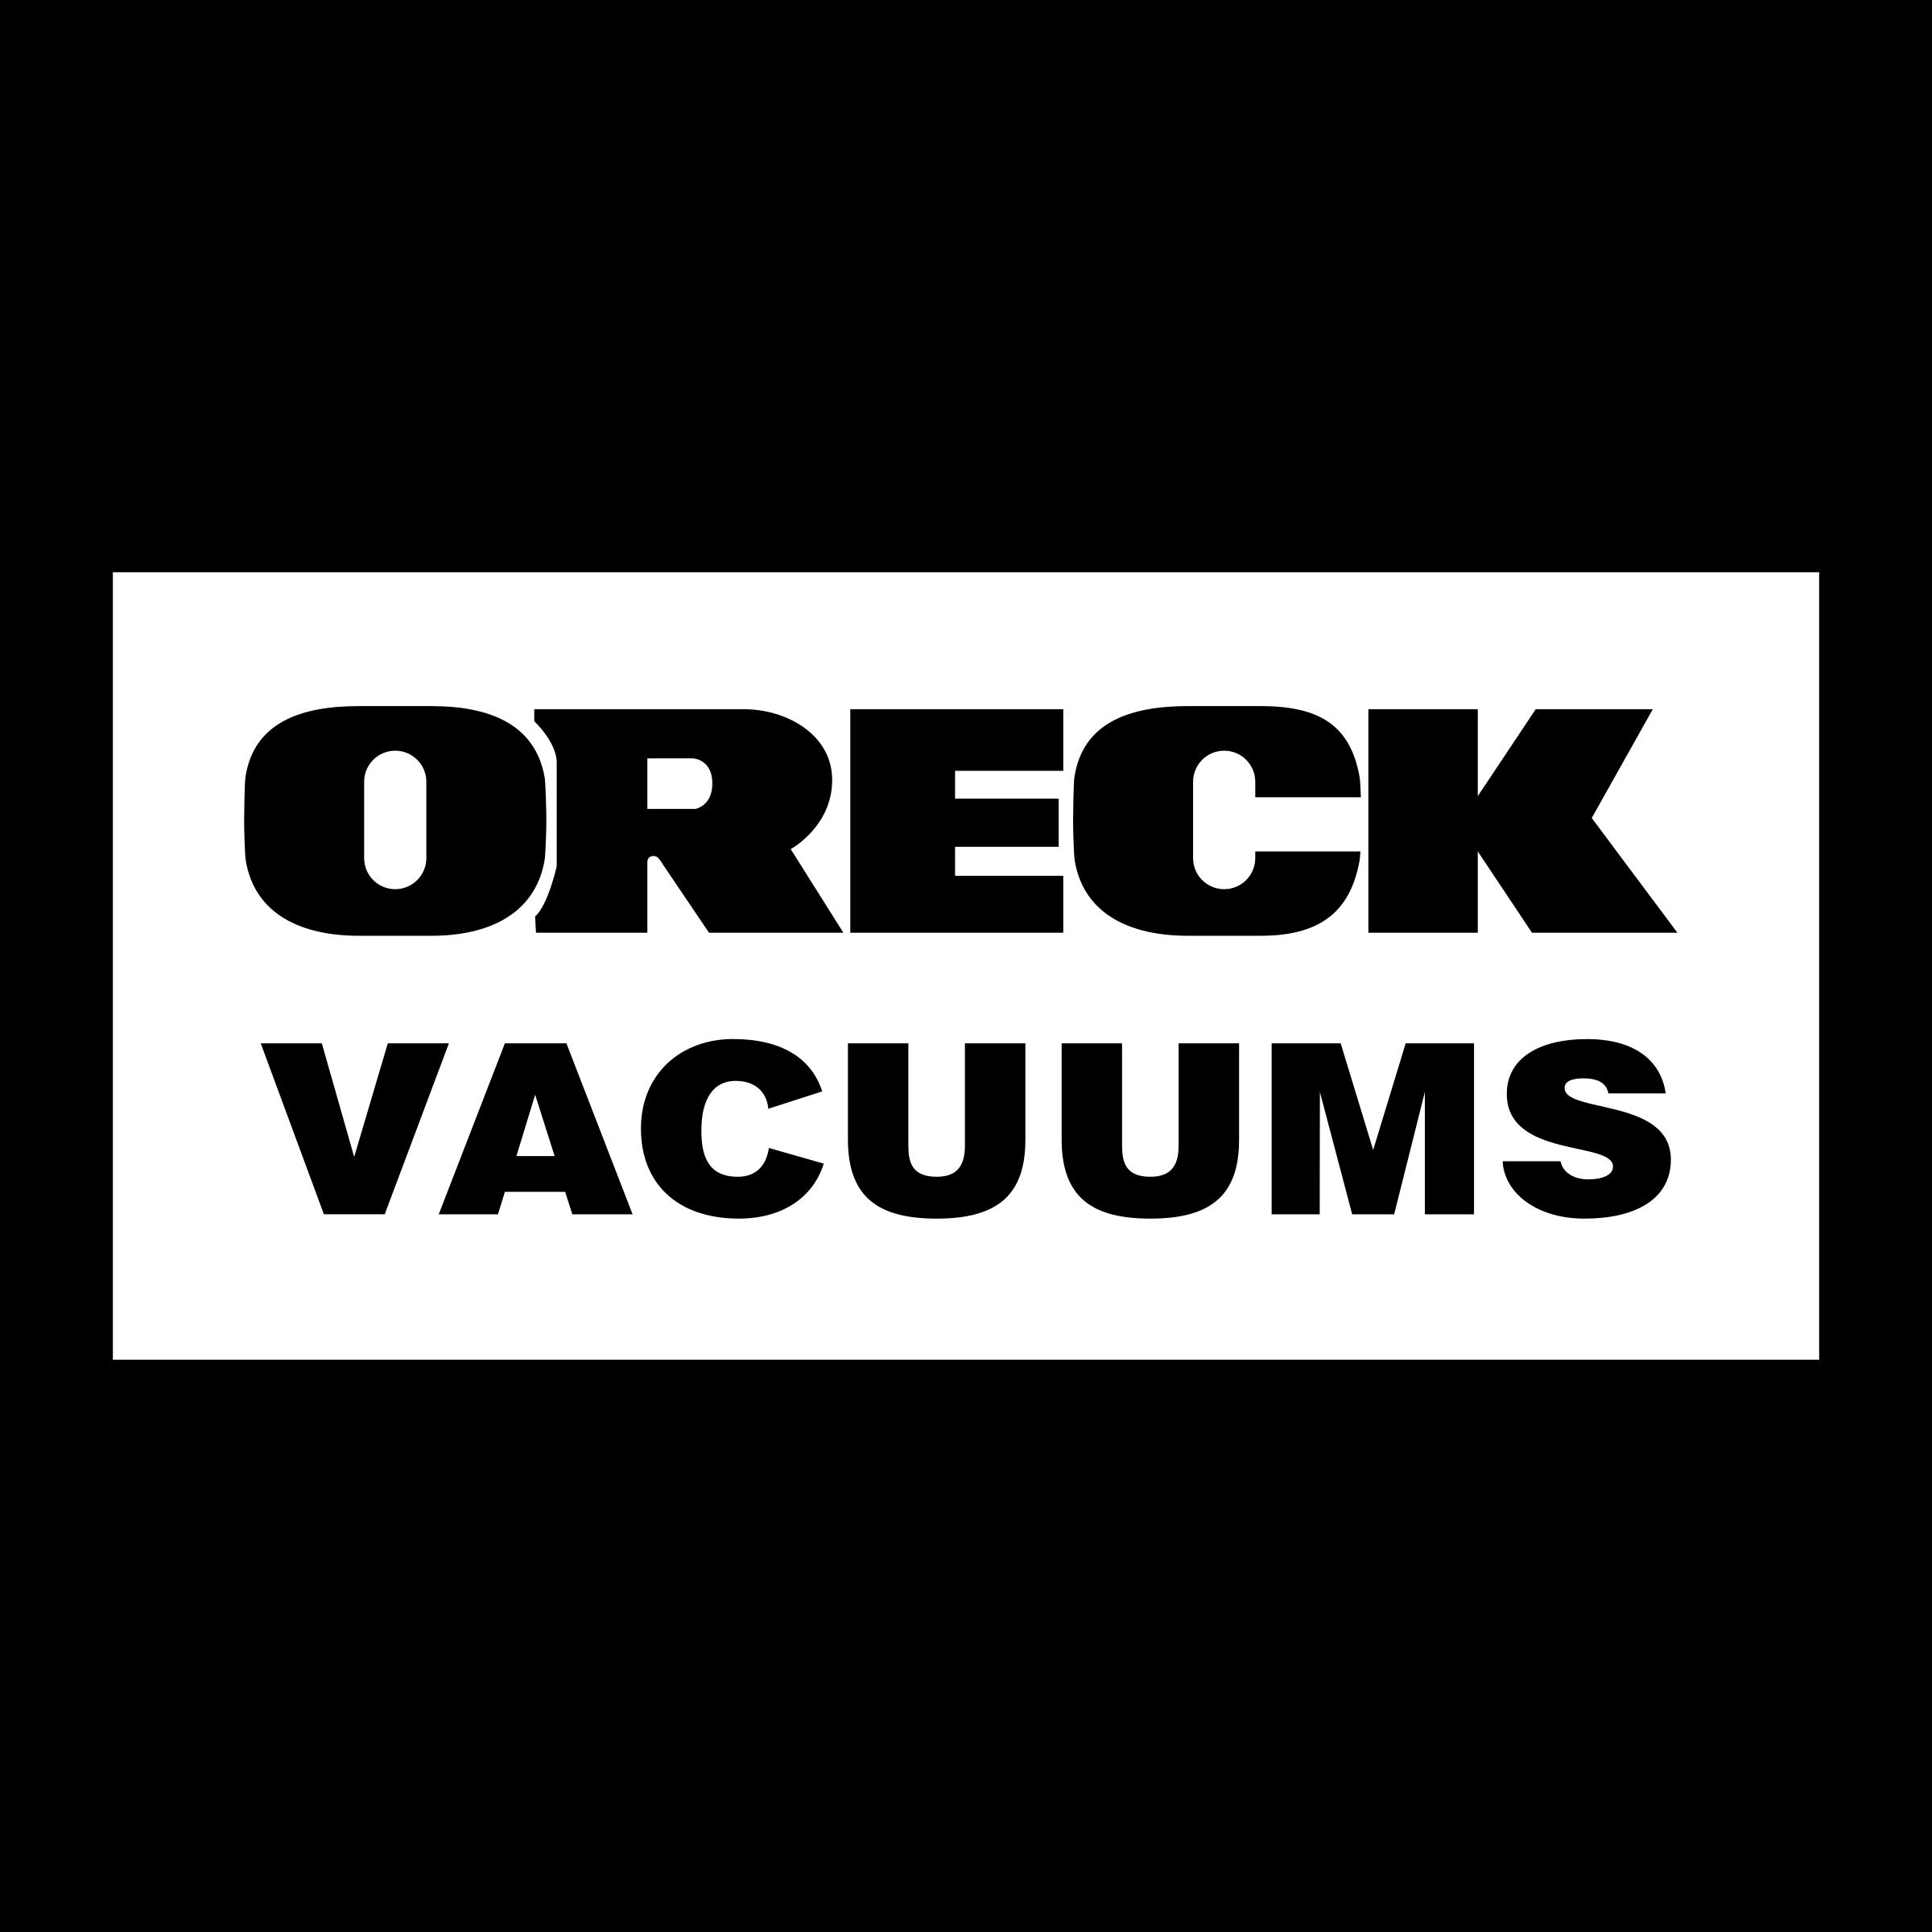 Oreck Vacuums Logo PNG Transparent & SVG Vector.